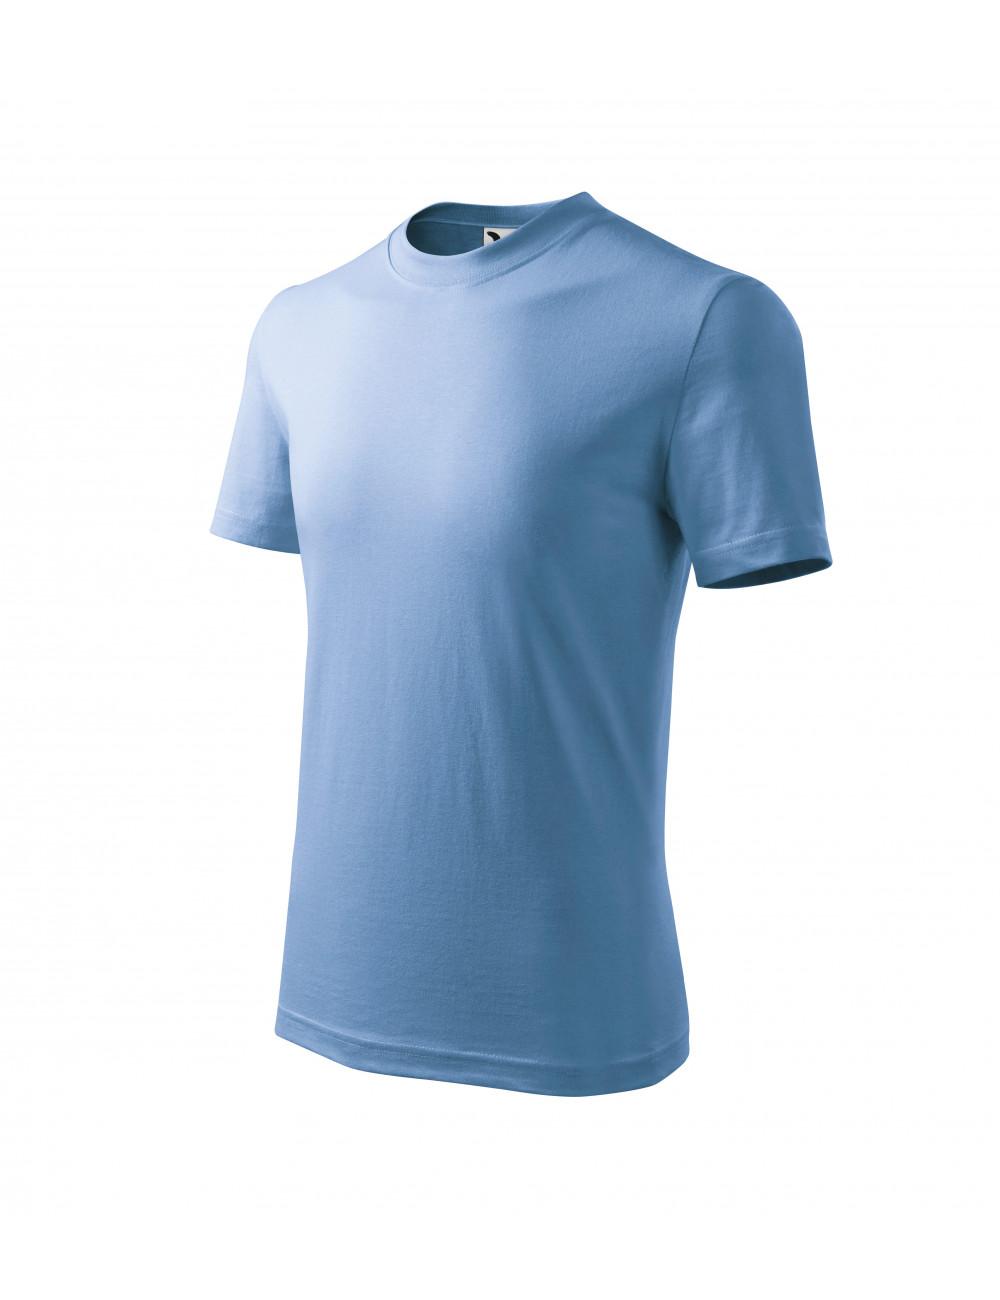 Adler MALFINI Koszulka dziecięca Basic 138 błękitny